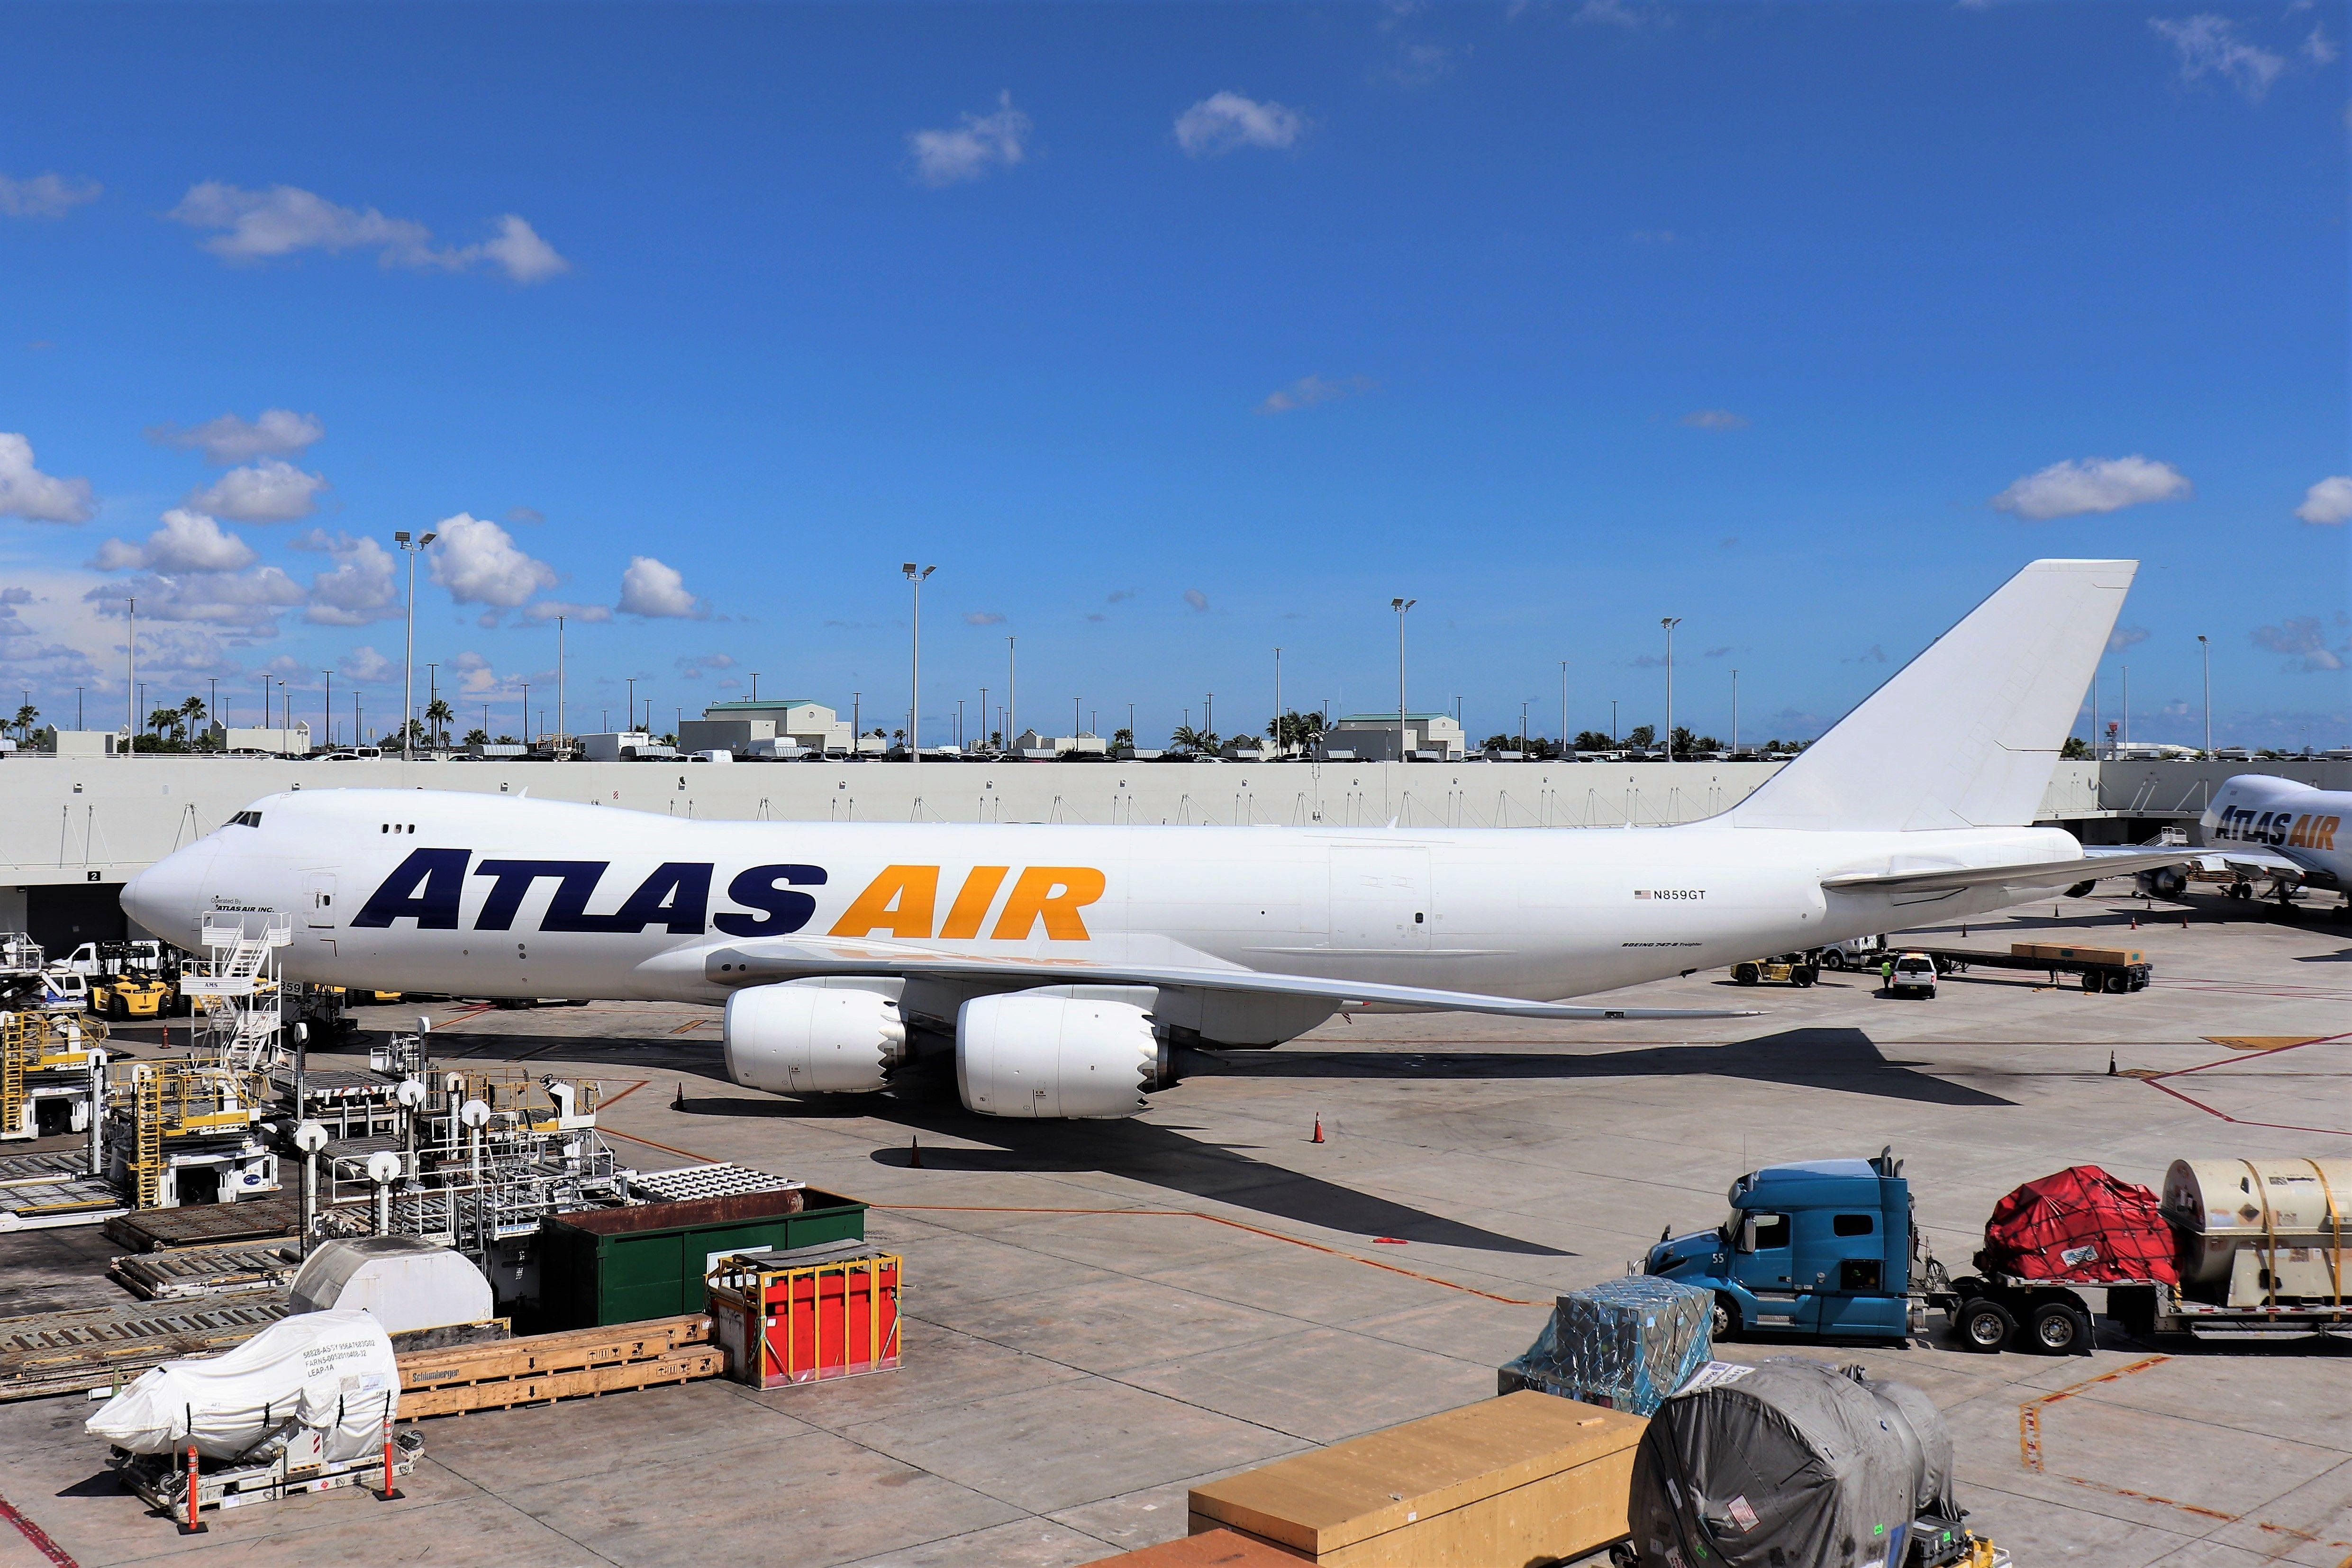 Atlas Air 747 in 2020 Atlas air, Cargo airlines, Air